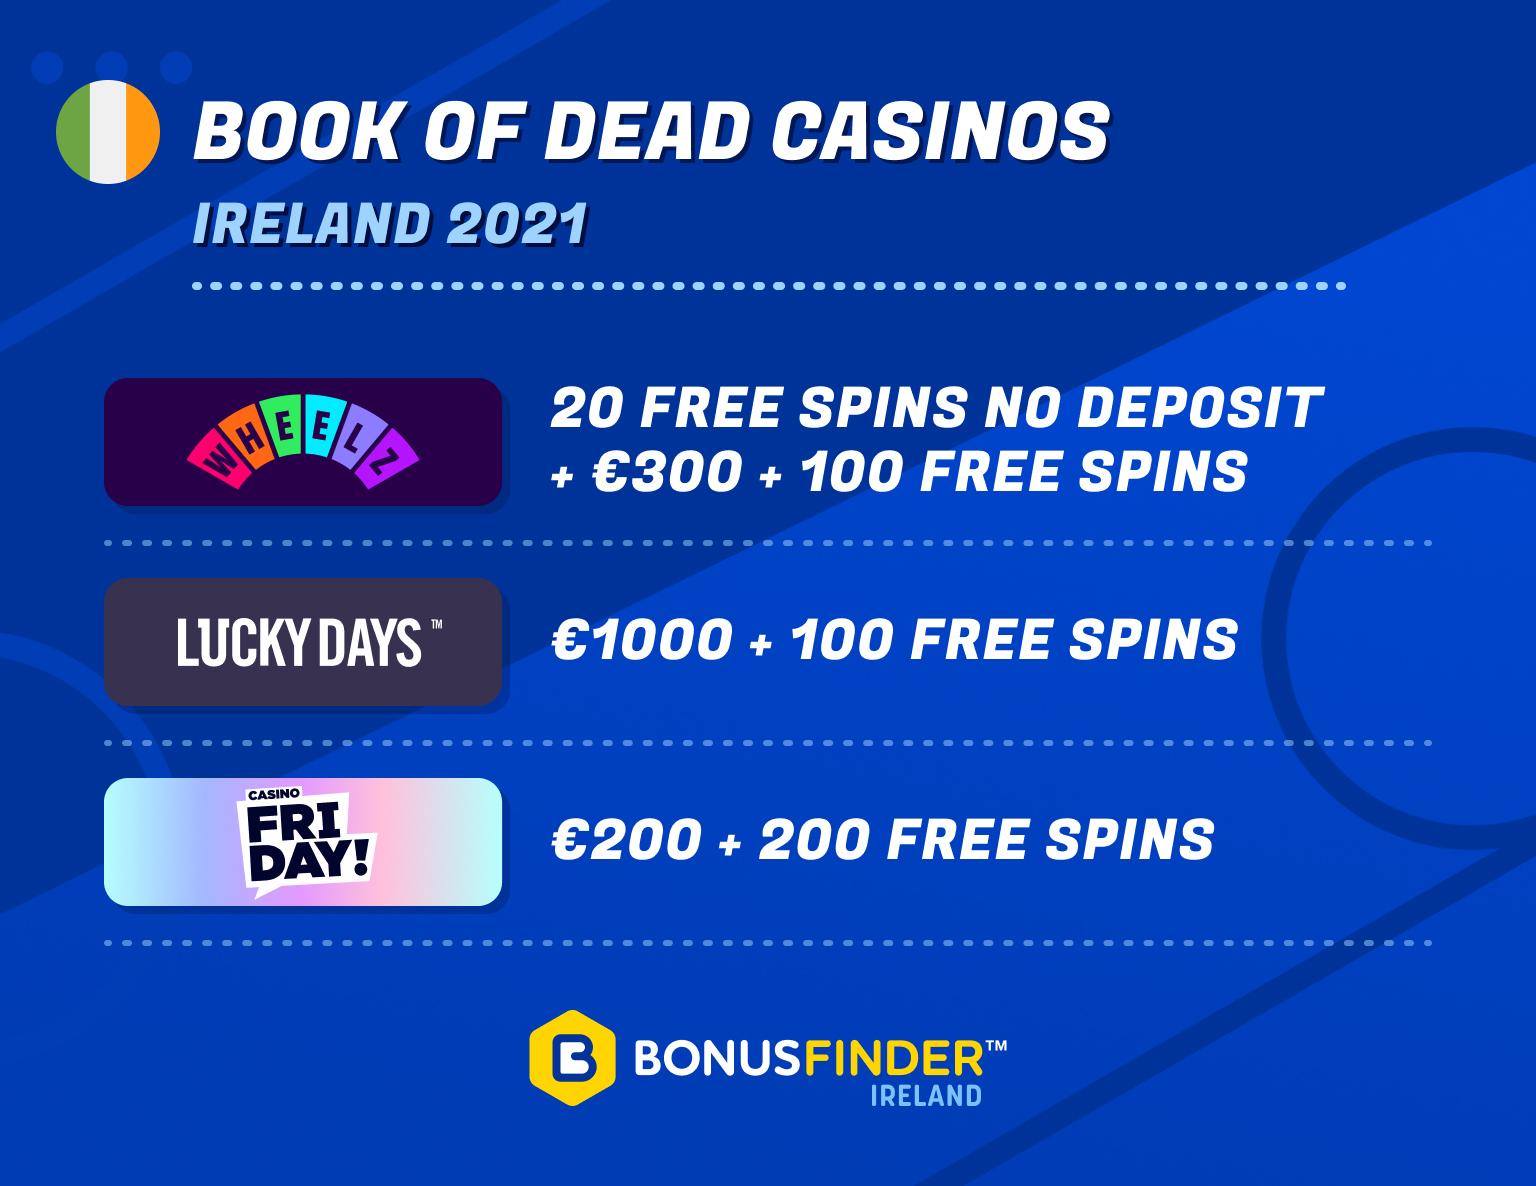 best book of dead casinos